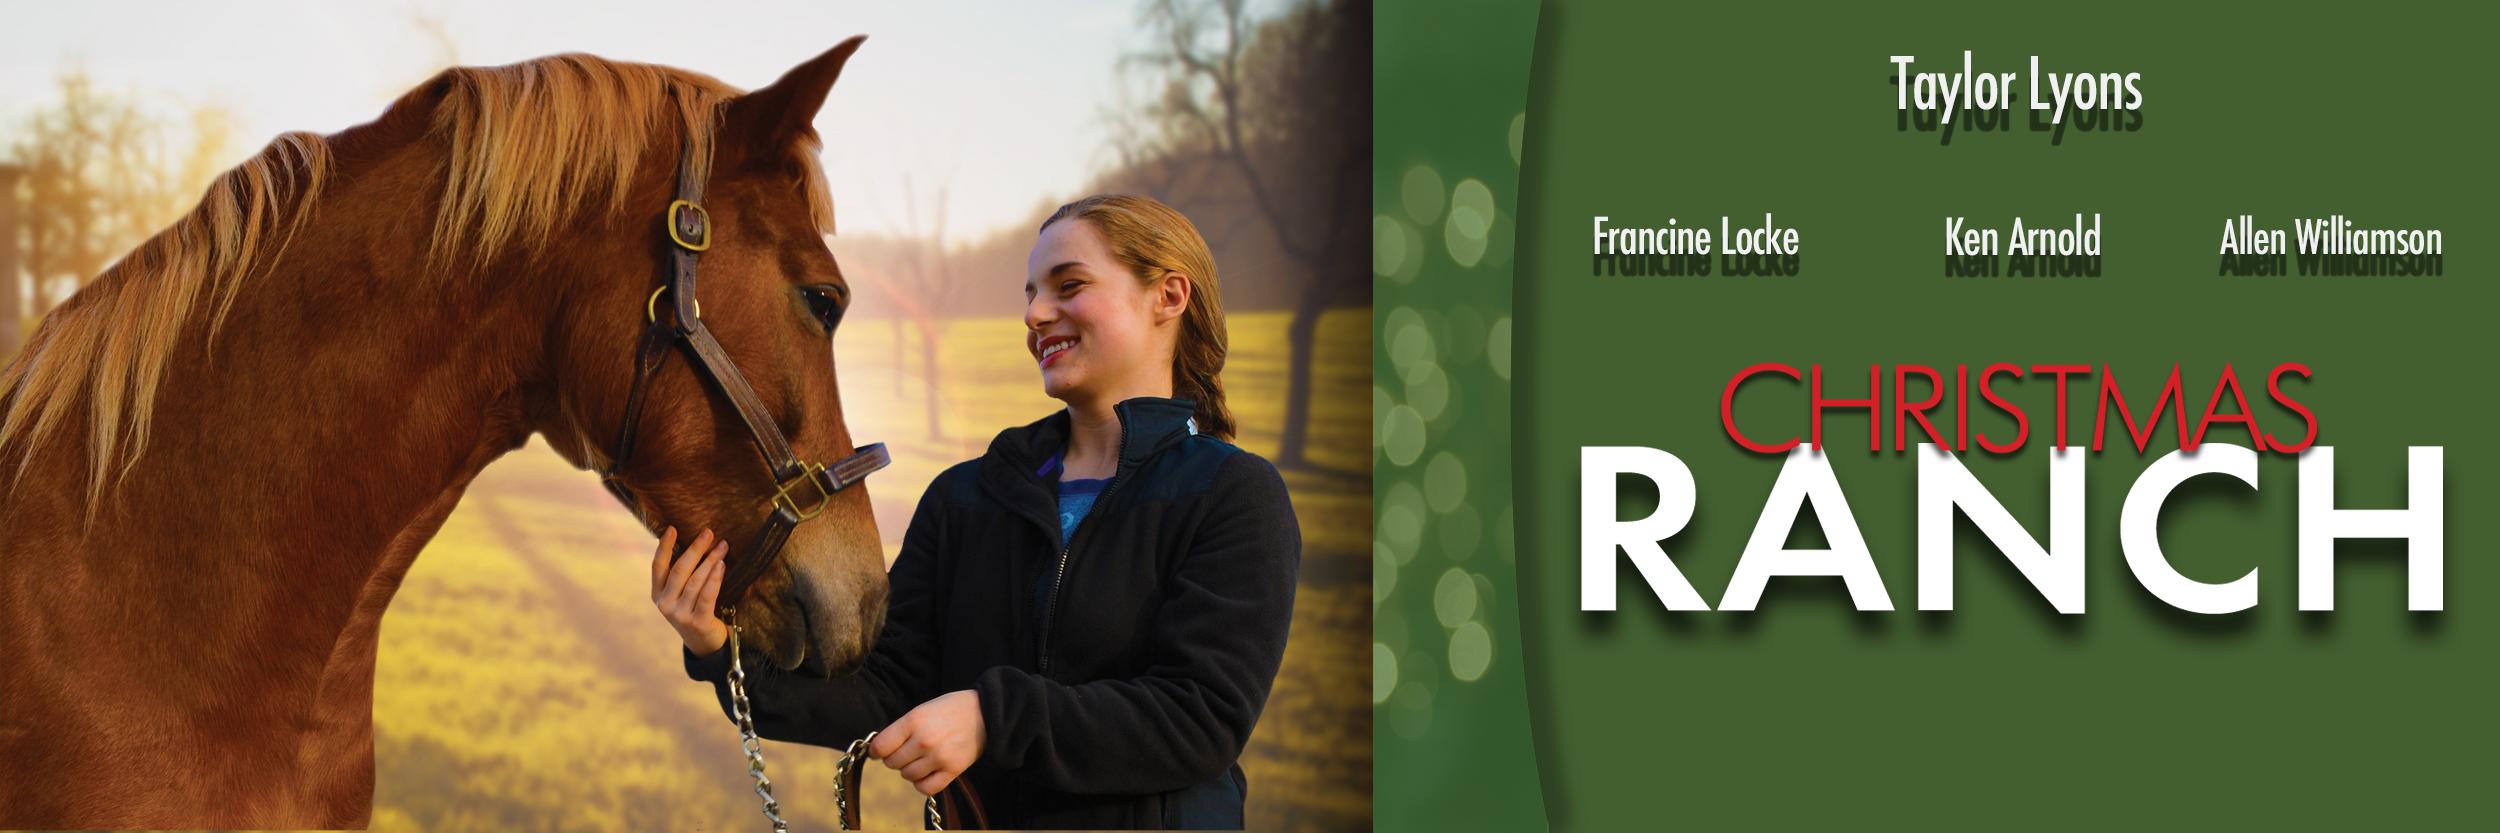 Christmas Ranch Slider